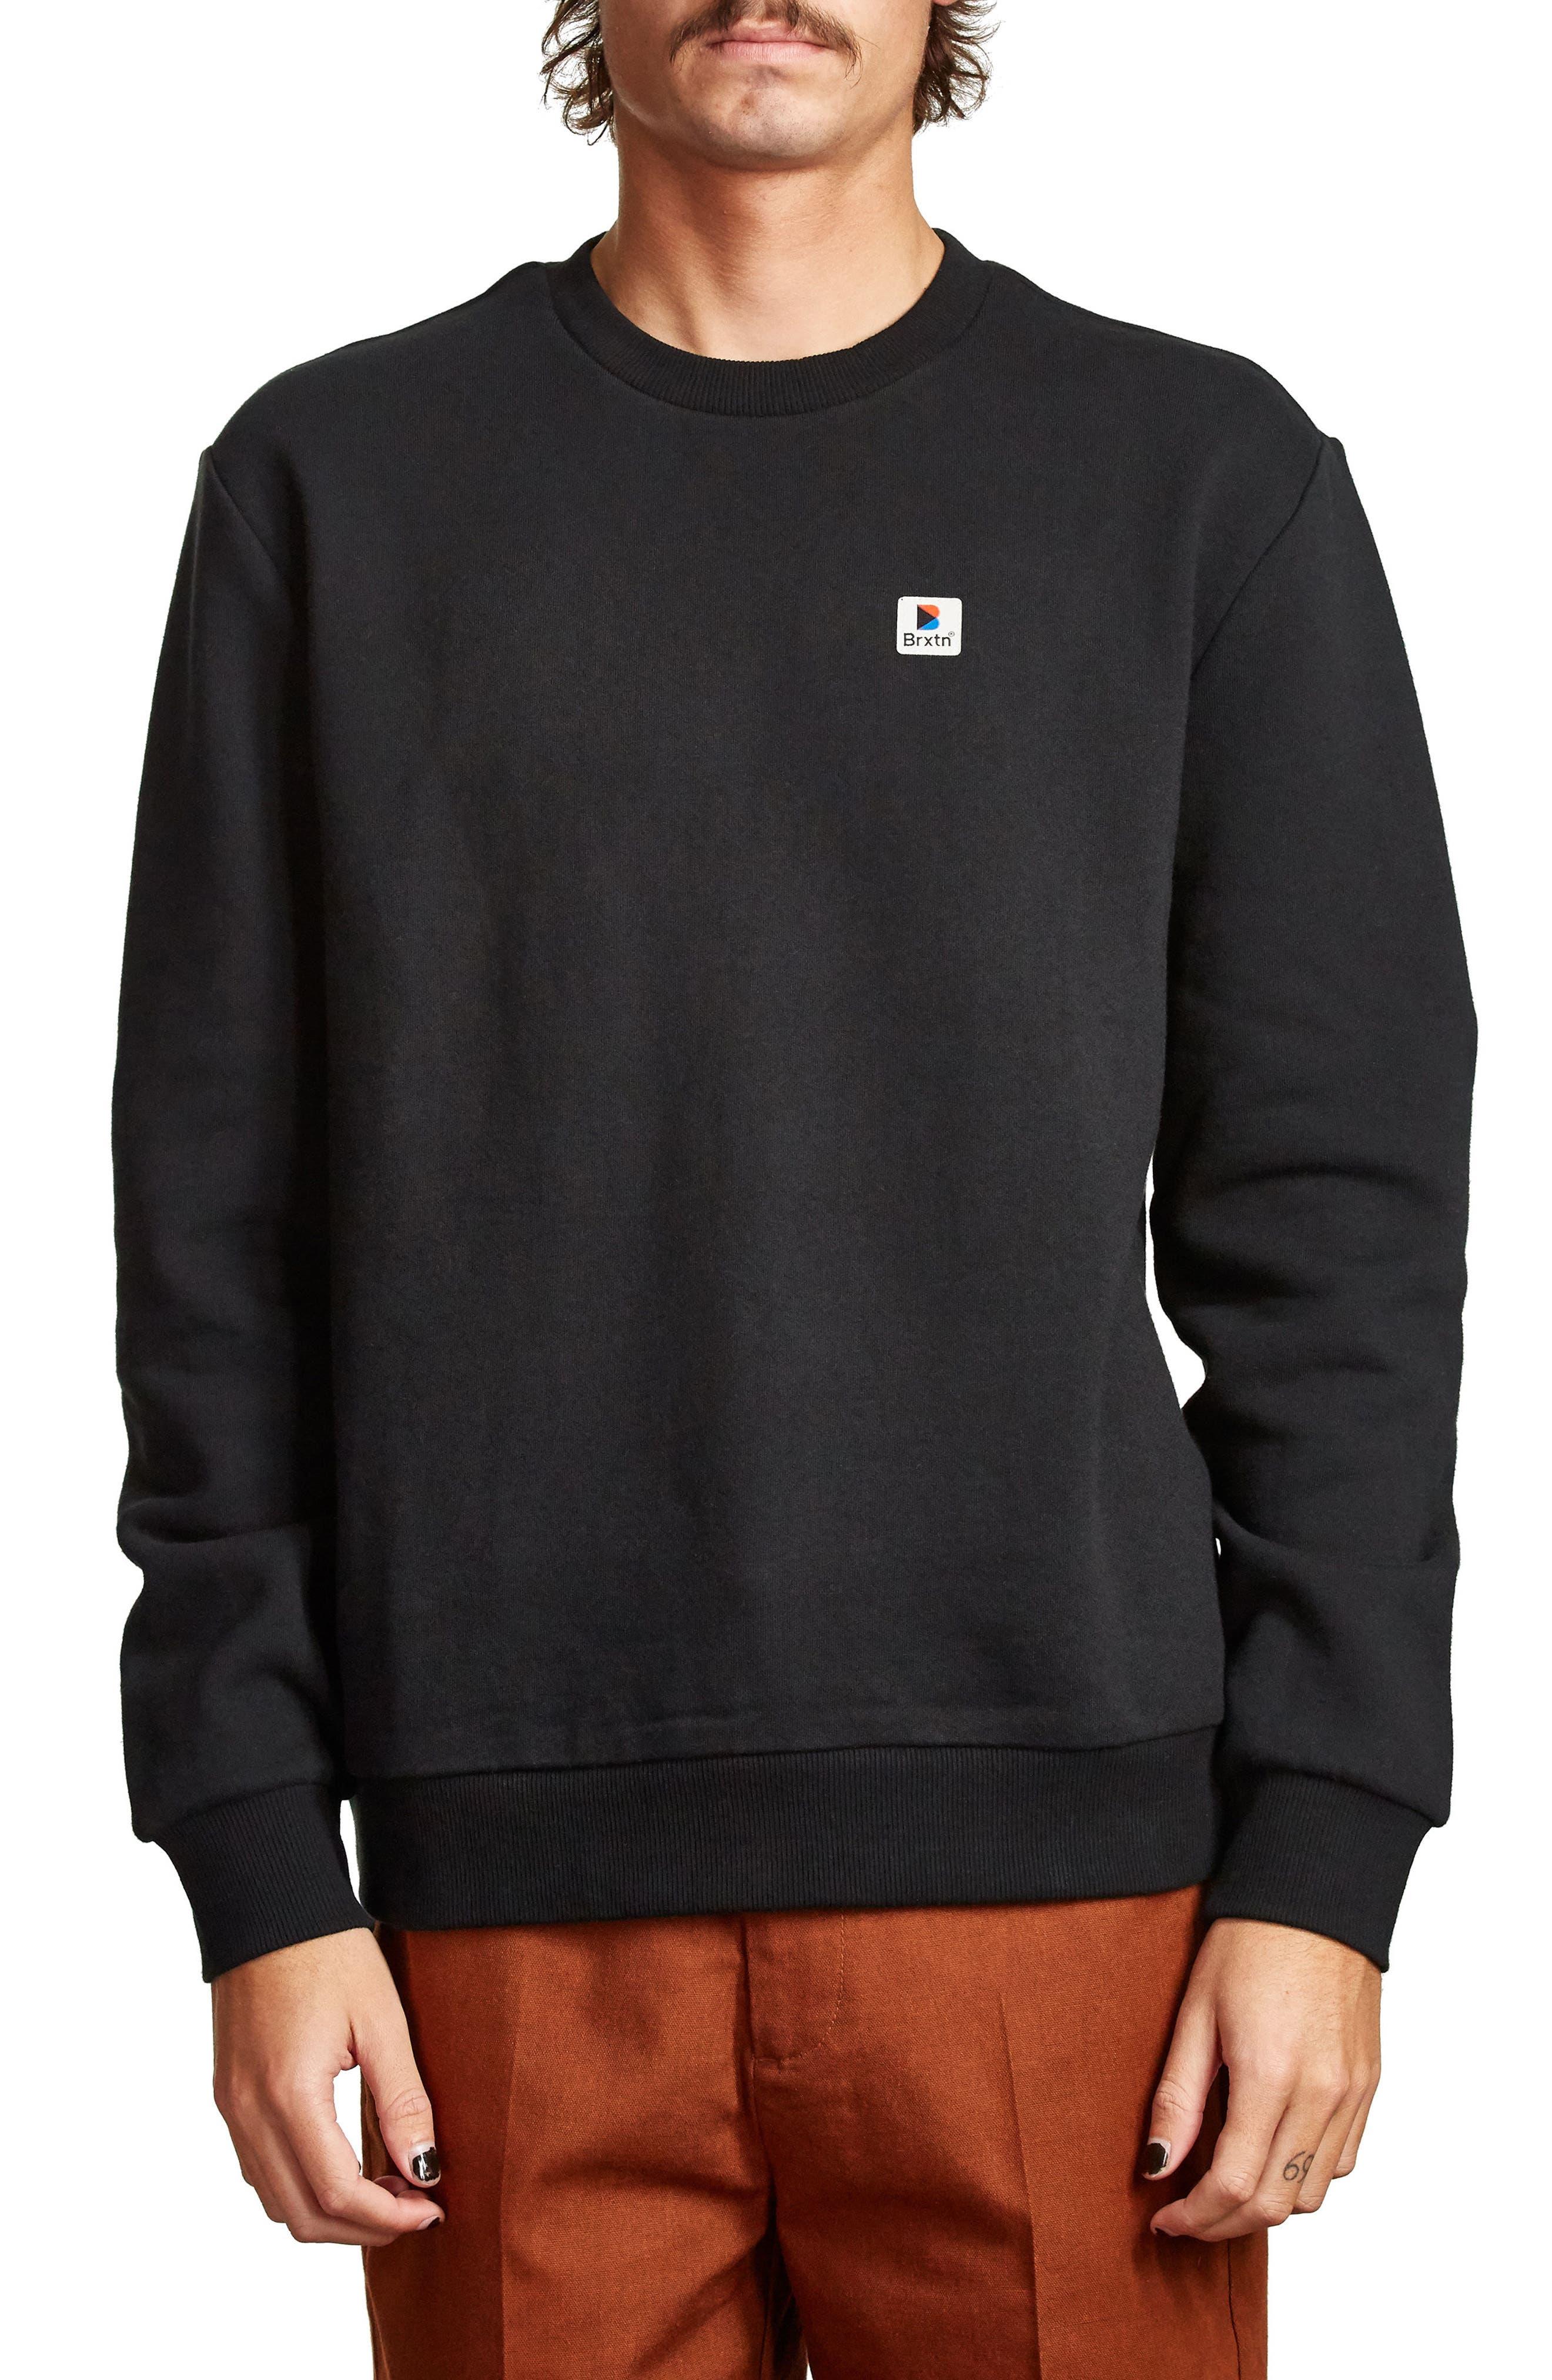 Stonewell Sweatshirt,                         Main,                         color, 001